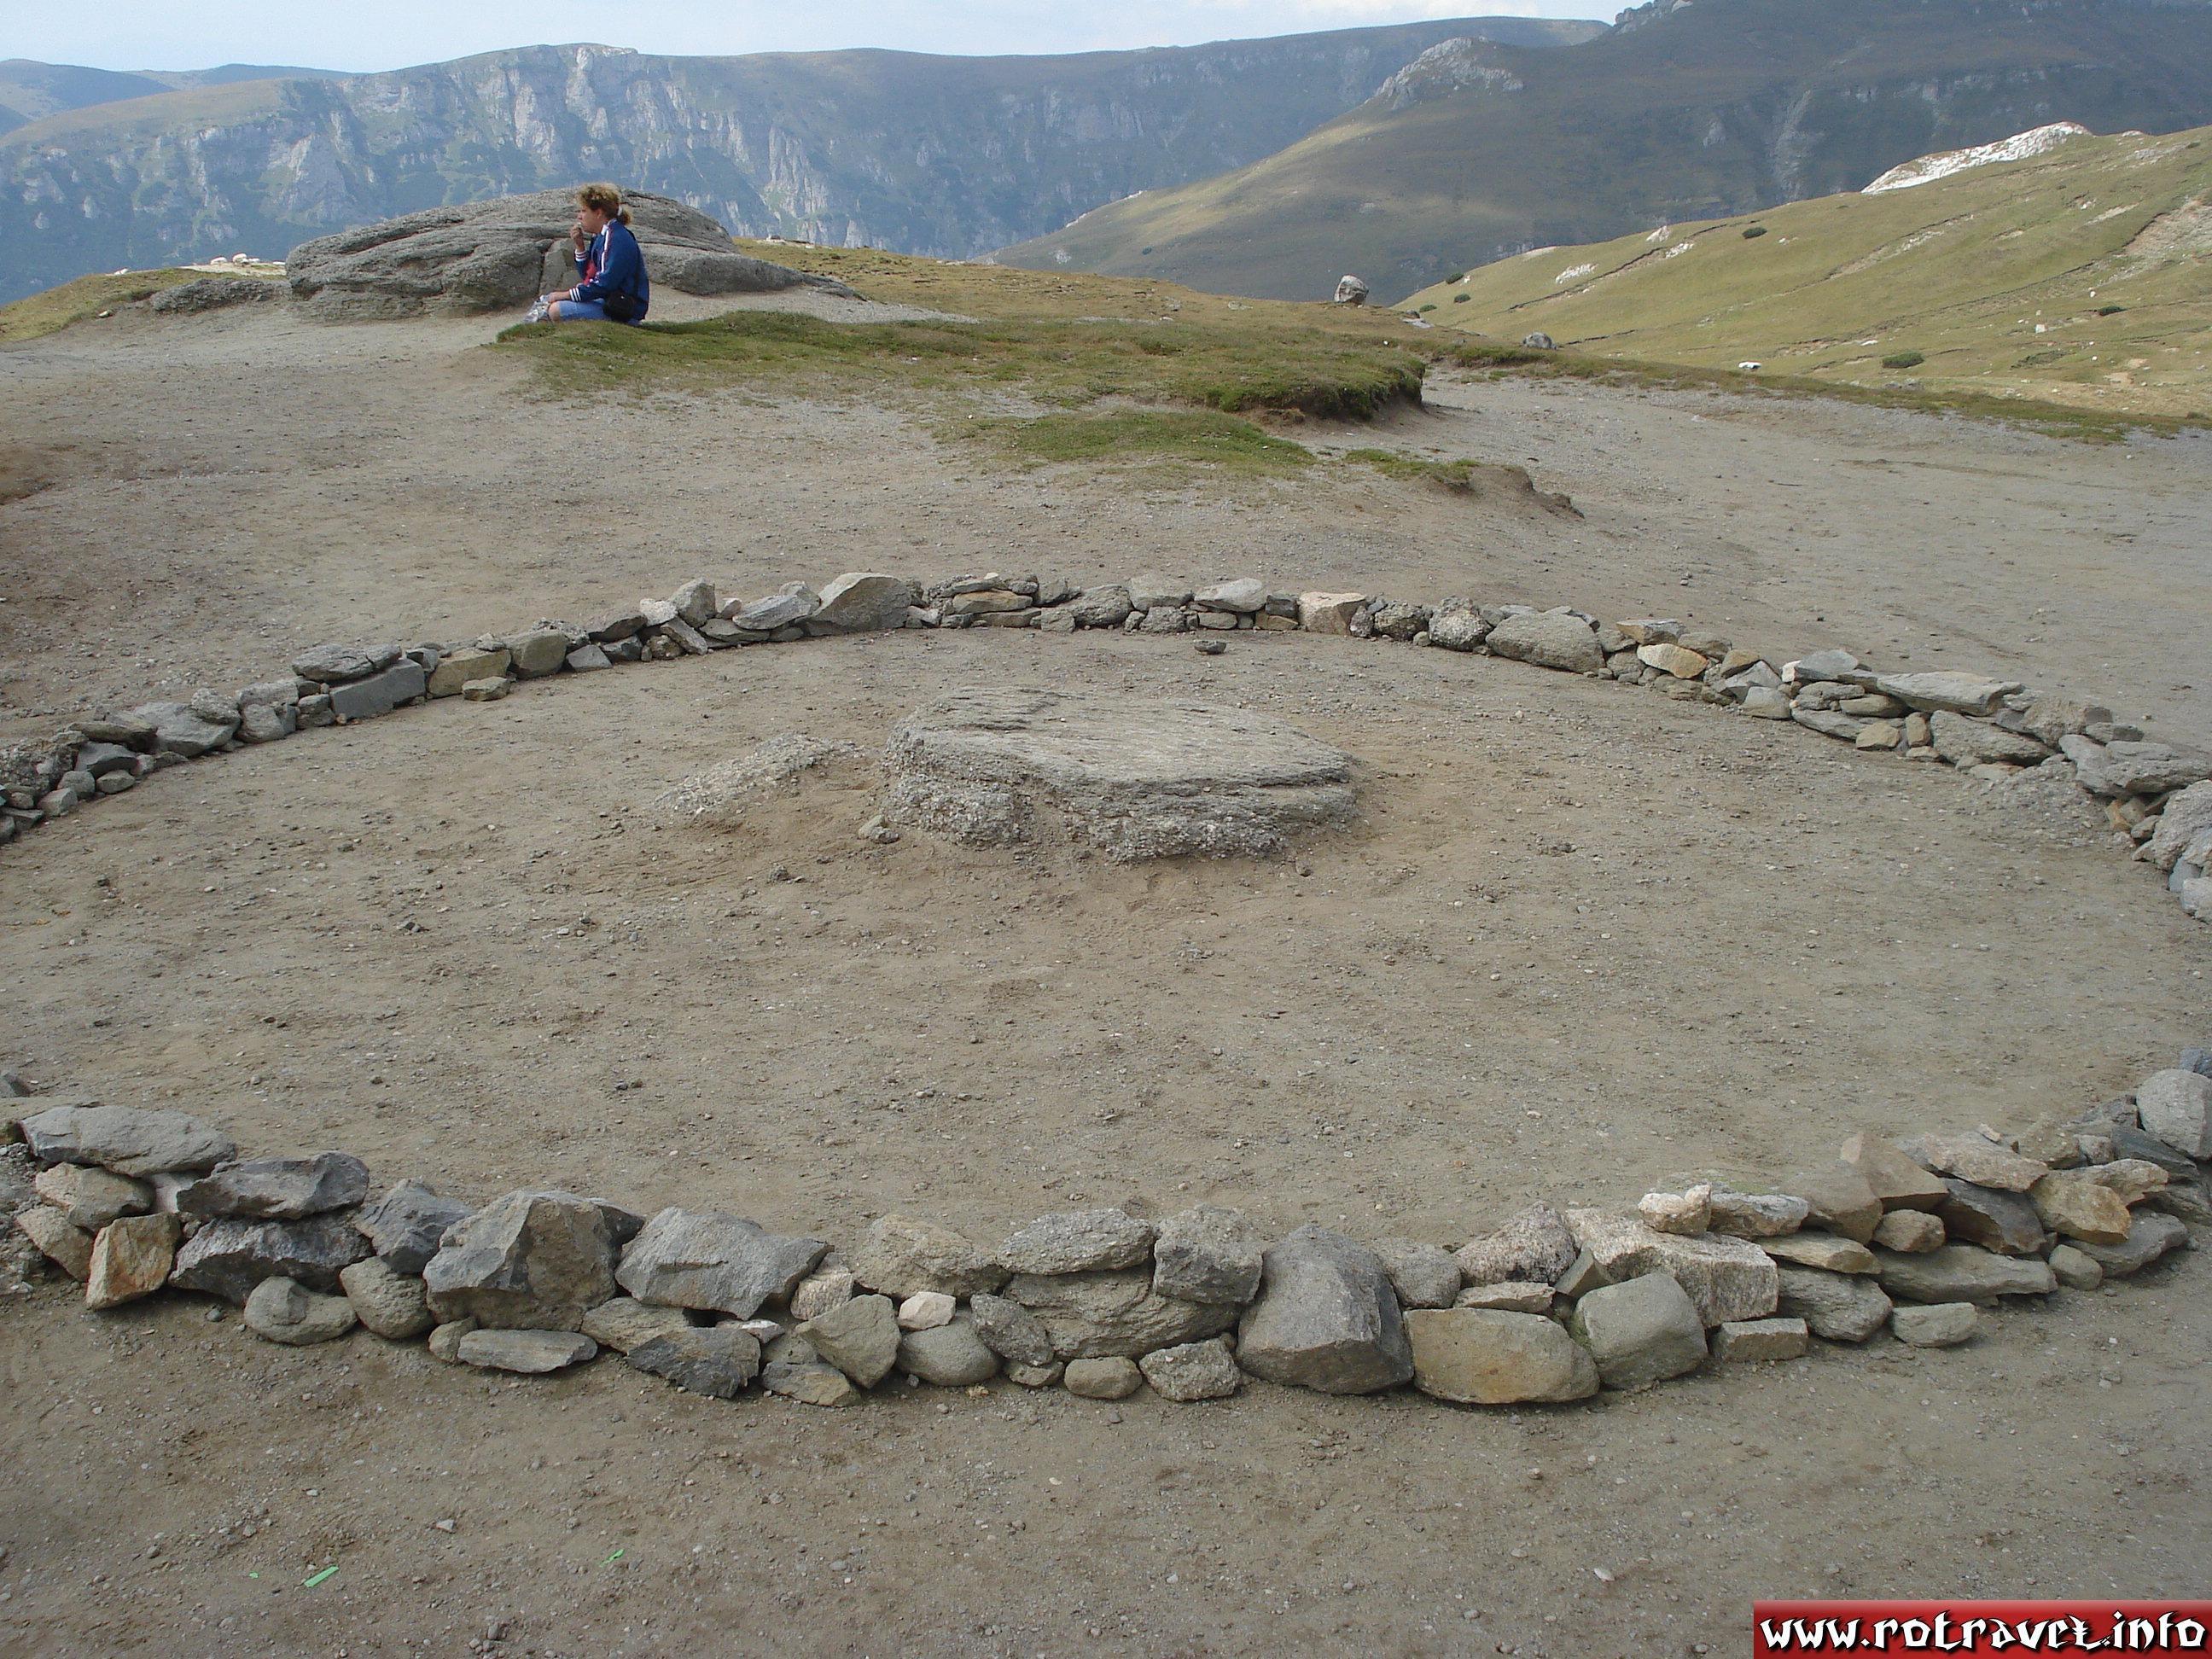 Circular sanctuary near the Sphinx